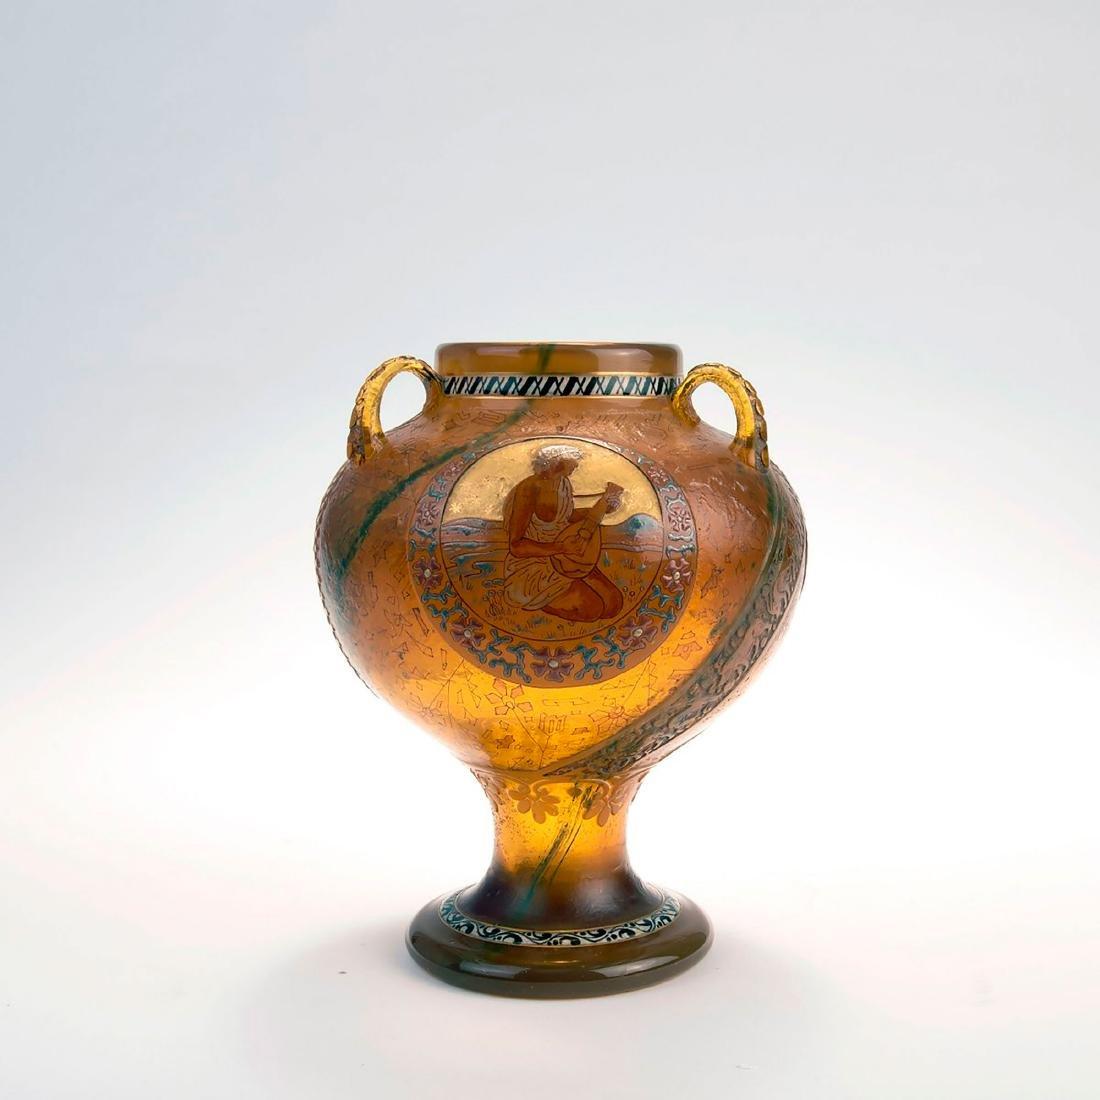 'Echoes of Hellas' vase with handles, 1895-1900 - 2